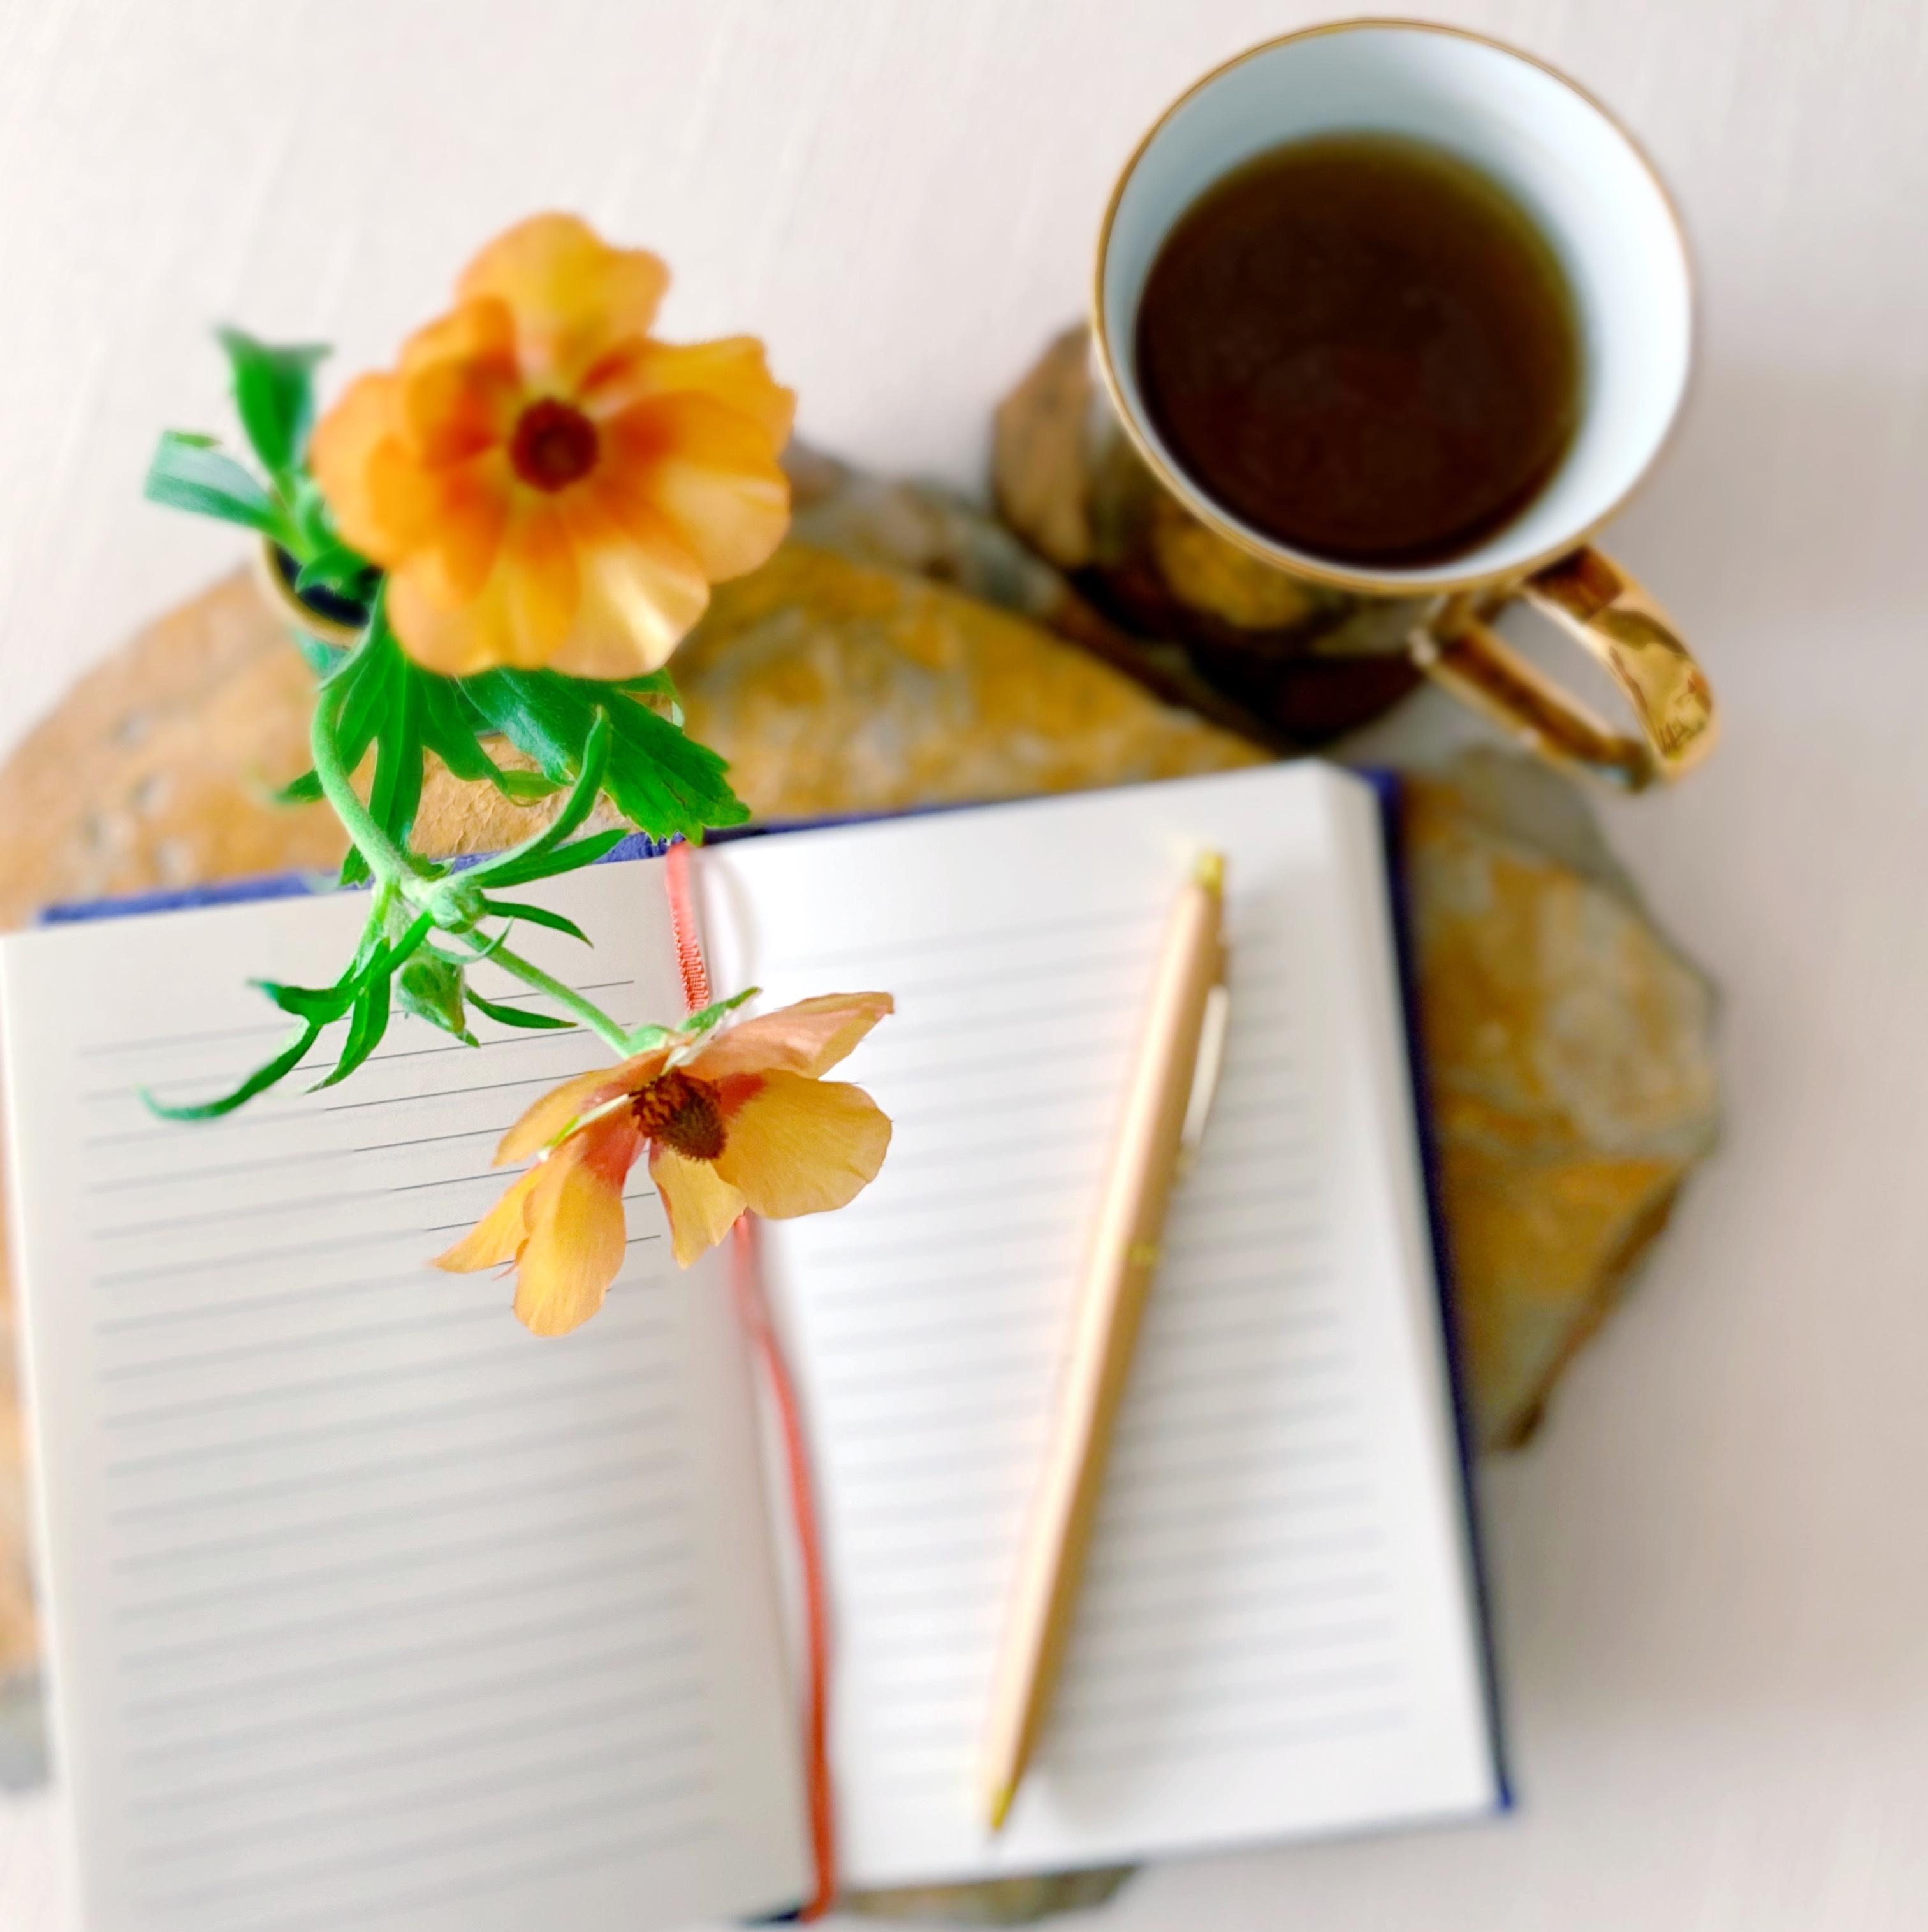 journal bookwork reflection journalling introvert